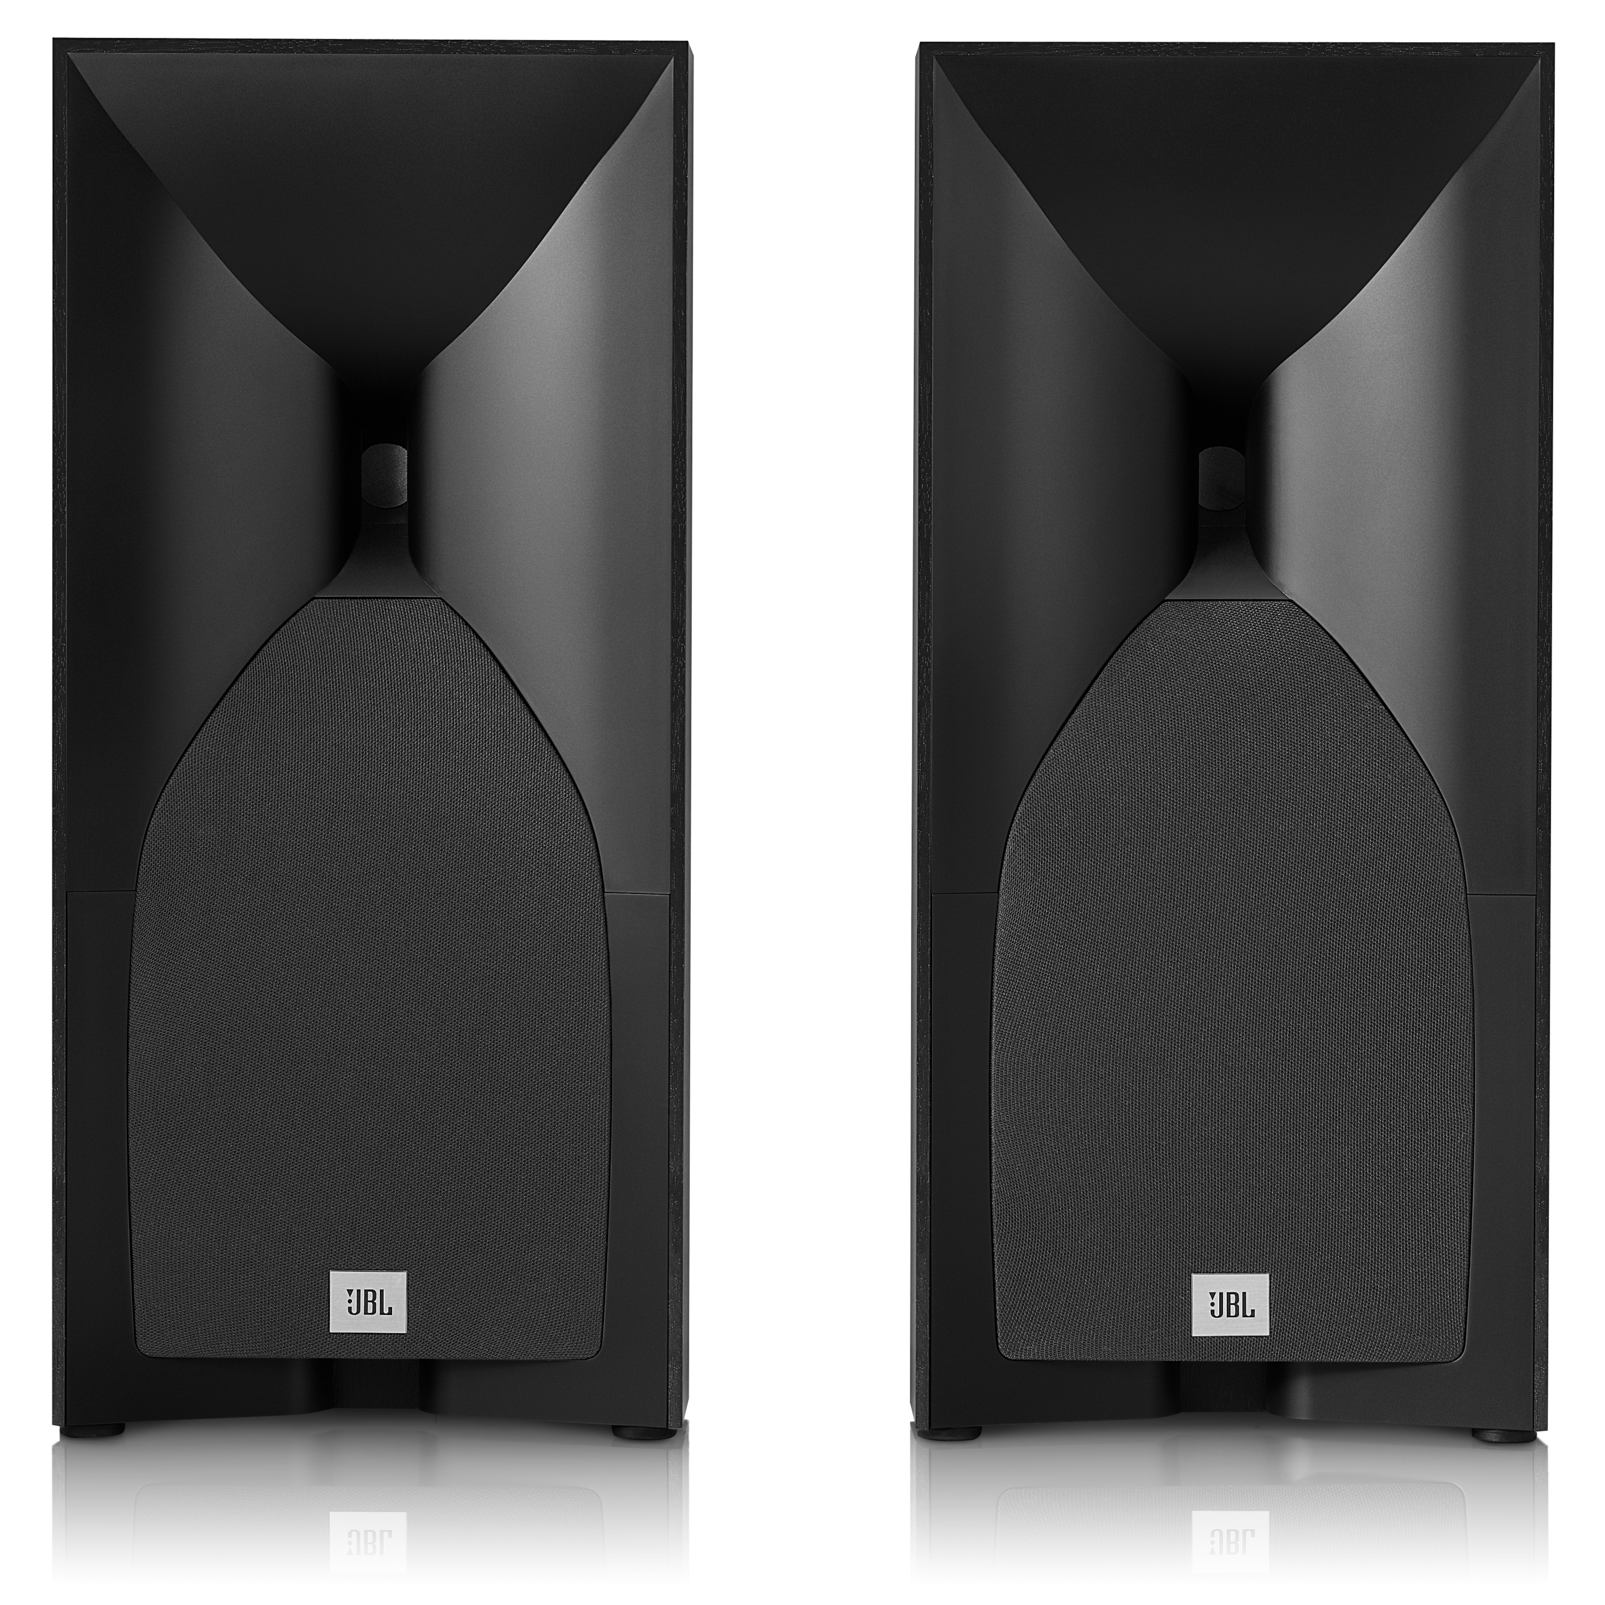 Studio 530 - Black - Professional-quality 125-watt Bookshelf Speakers - Front